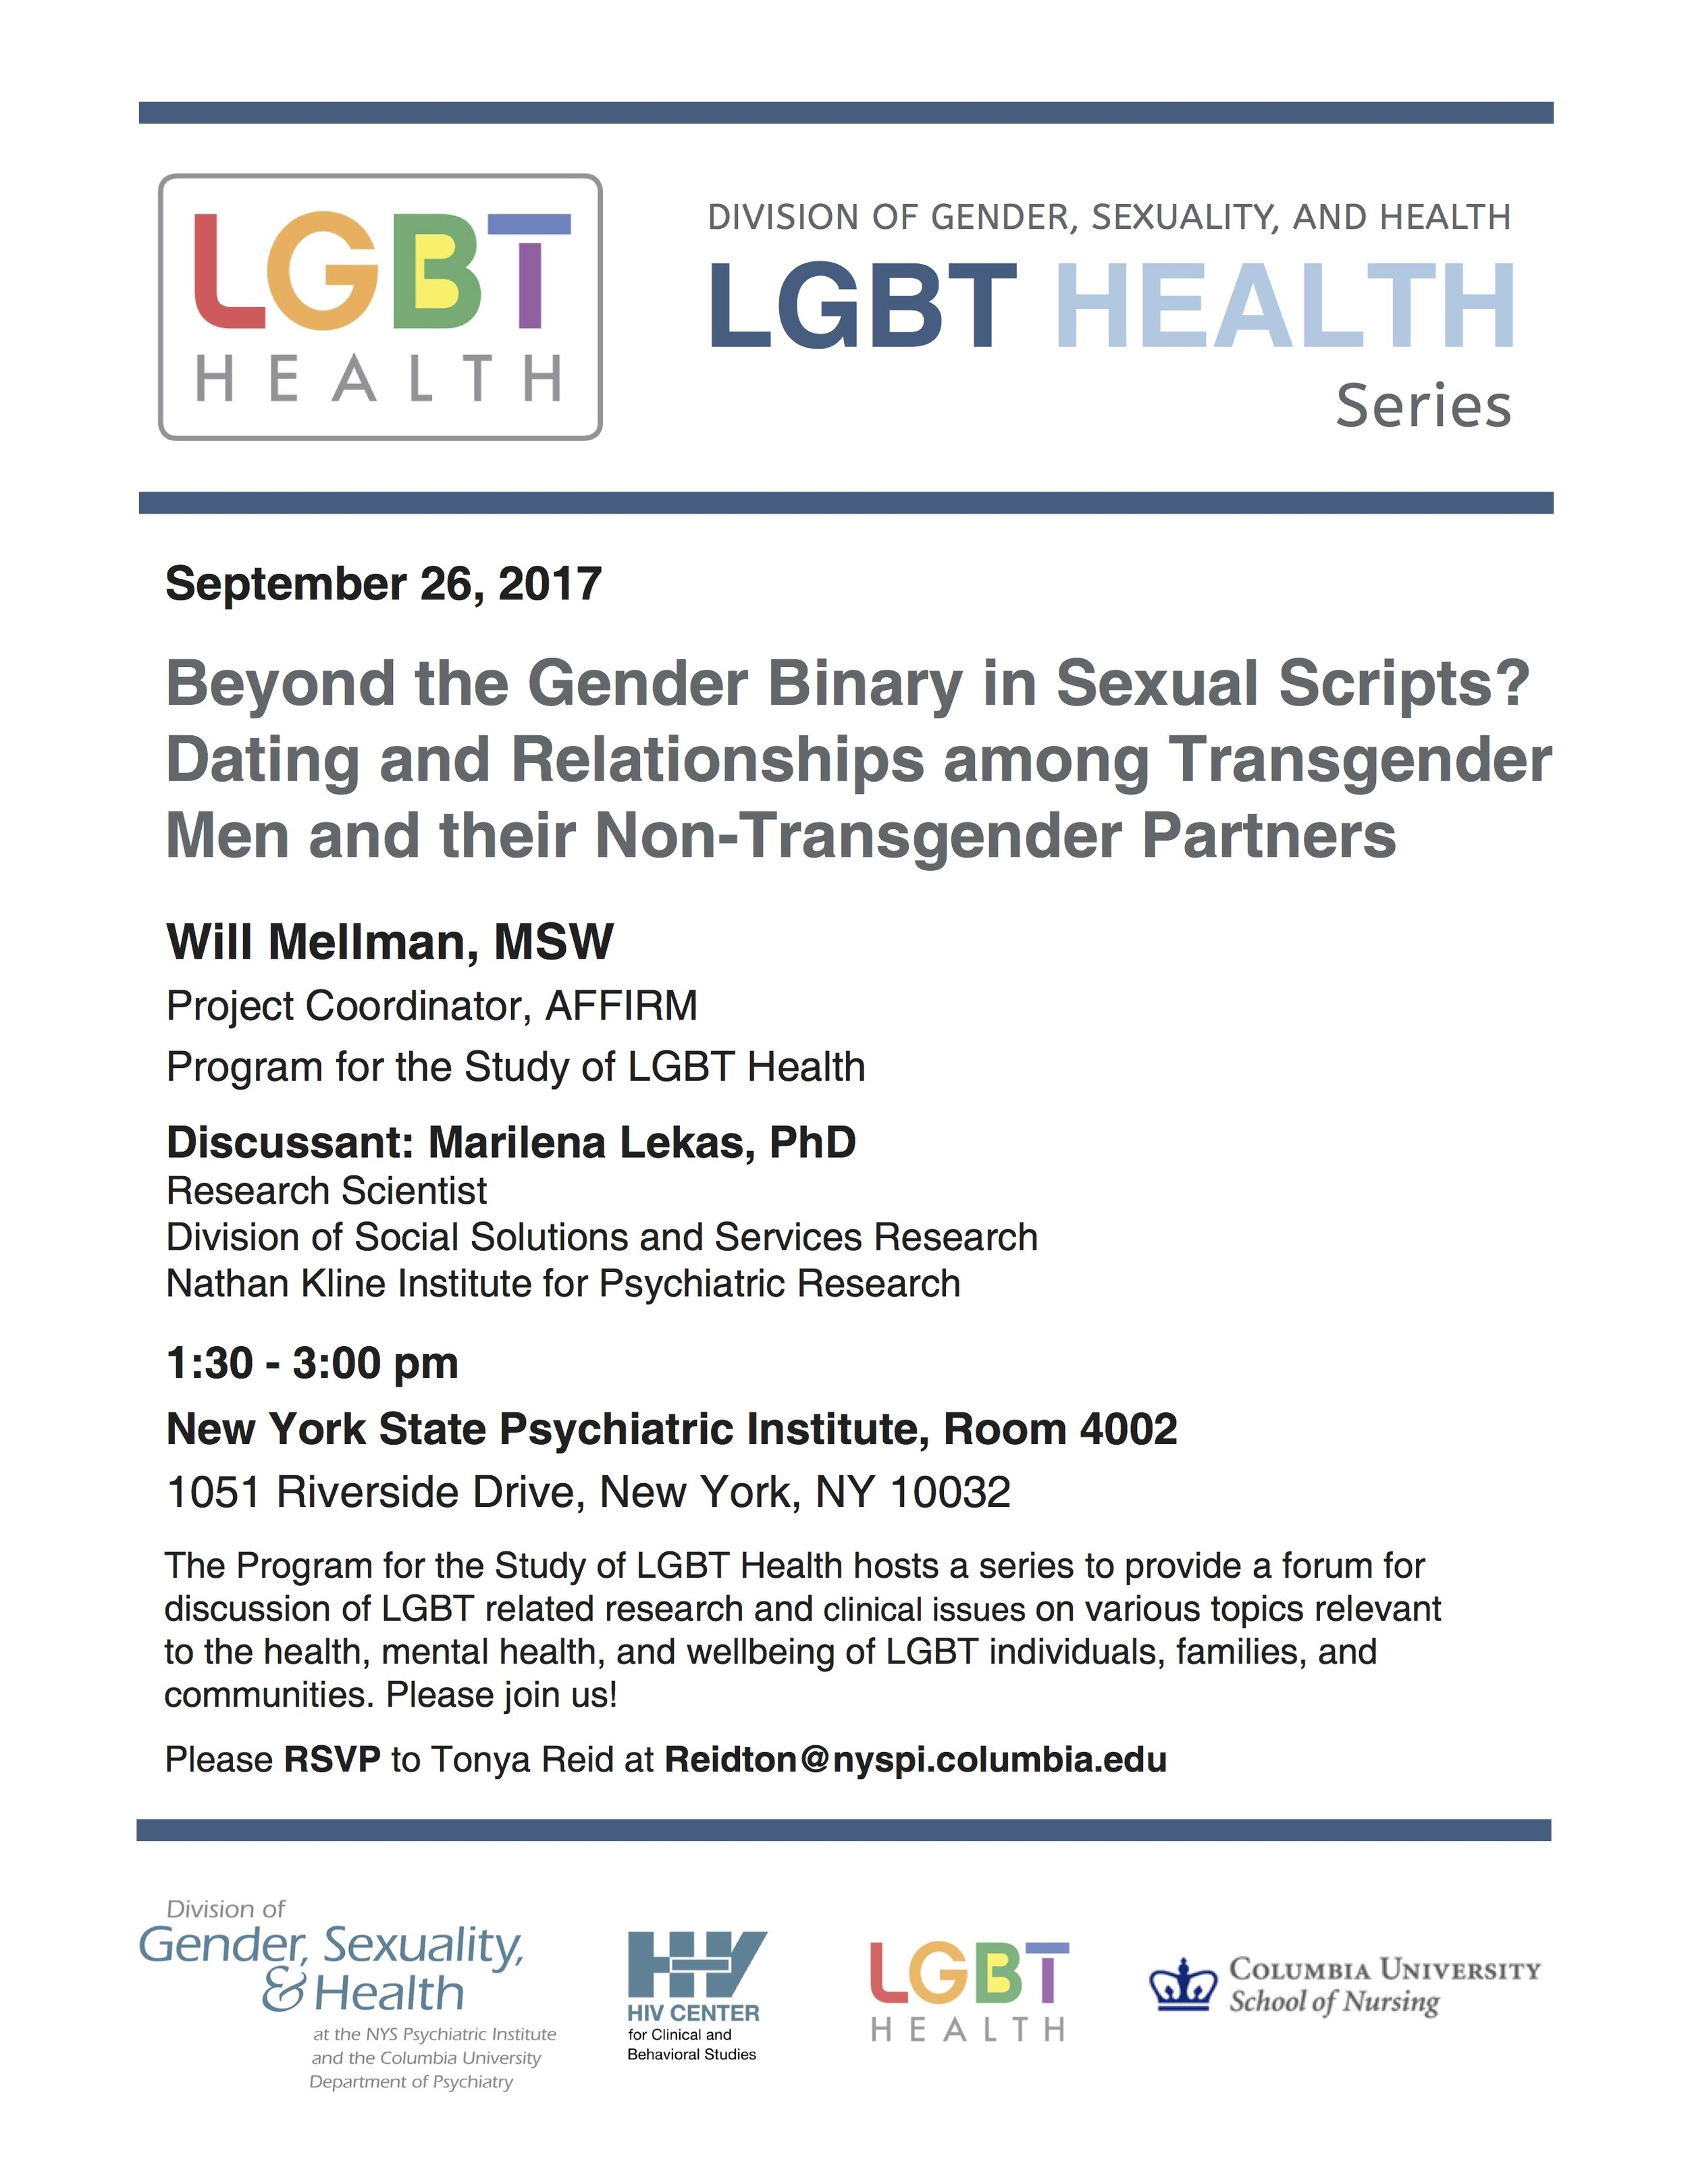 LGBT Health Series Sept 26 2017.jpg